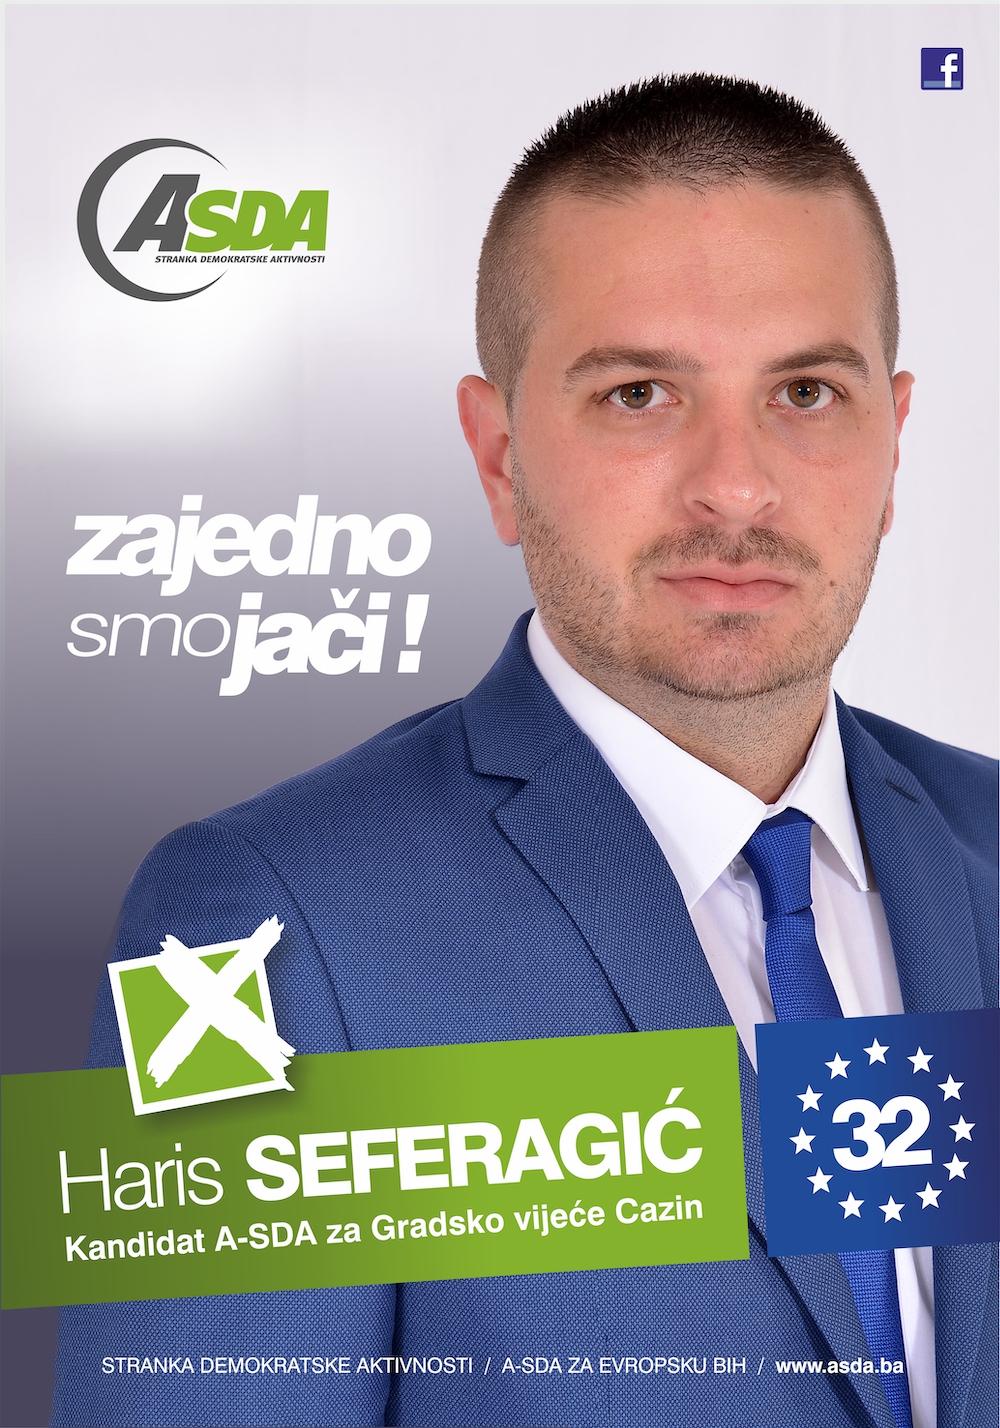 Haris Seferagić